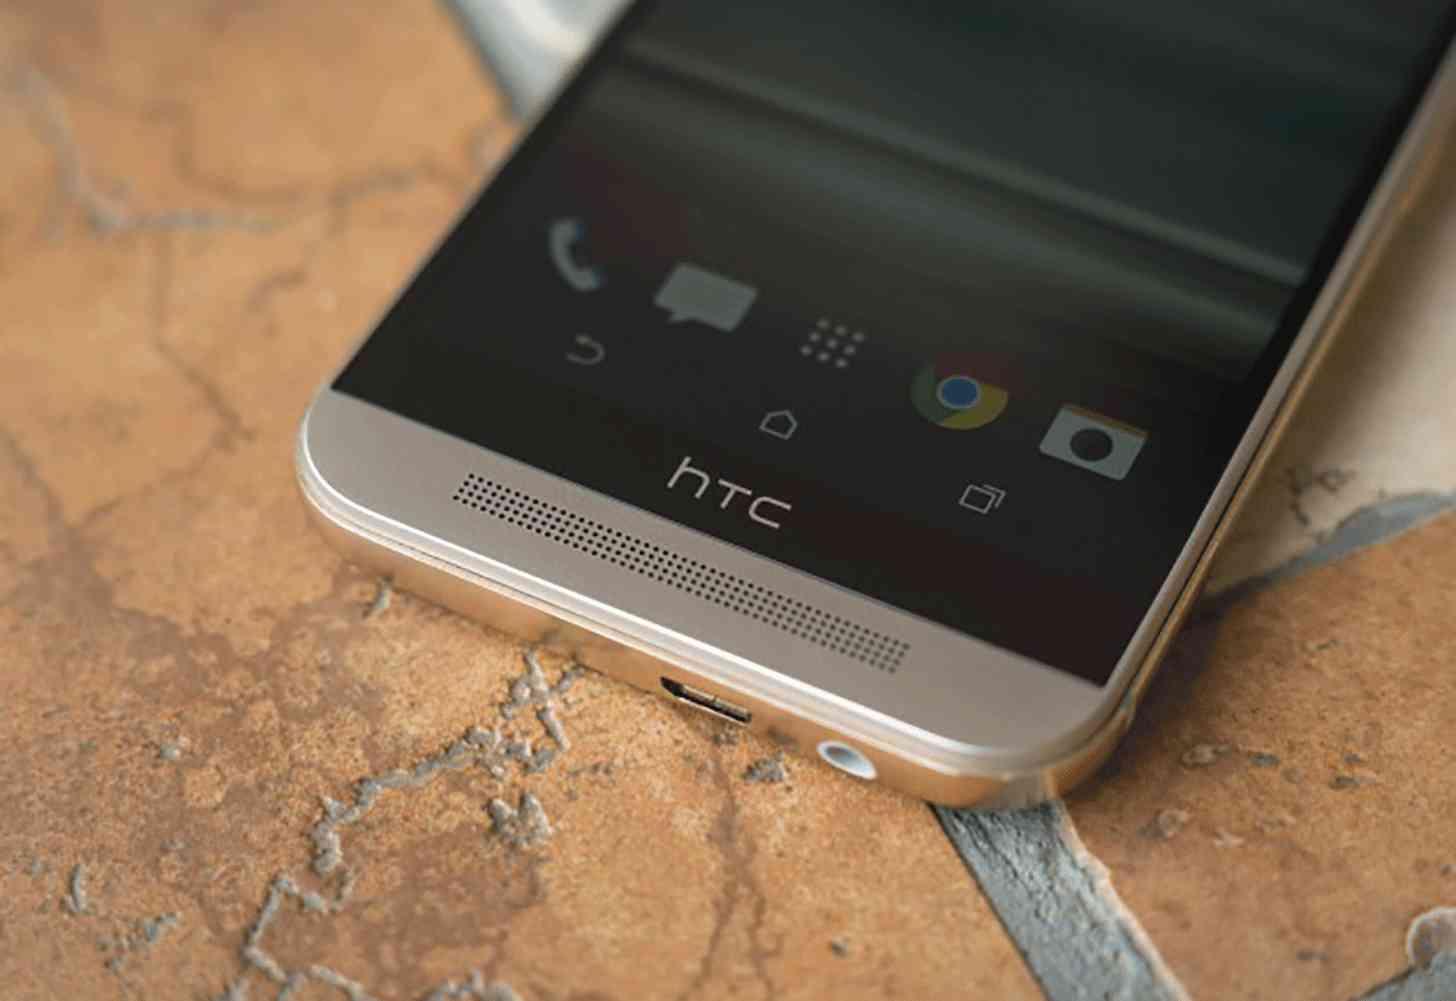 HTC One M9 bottom close